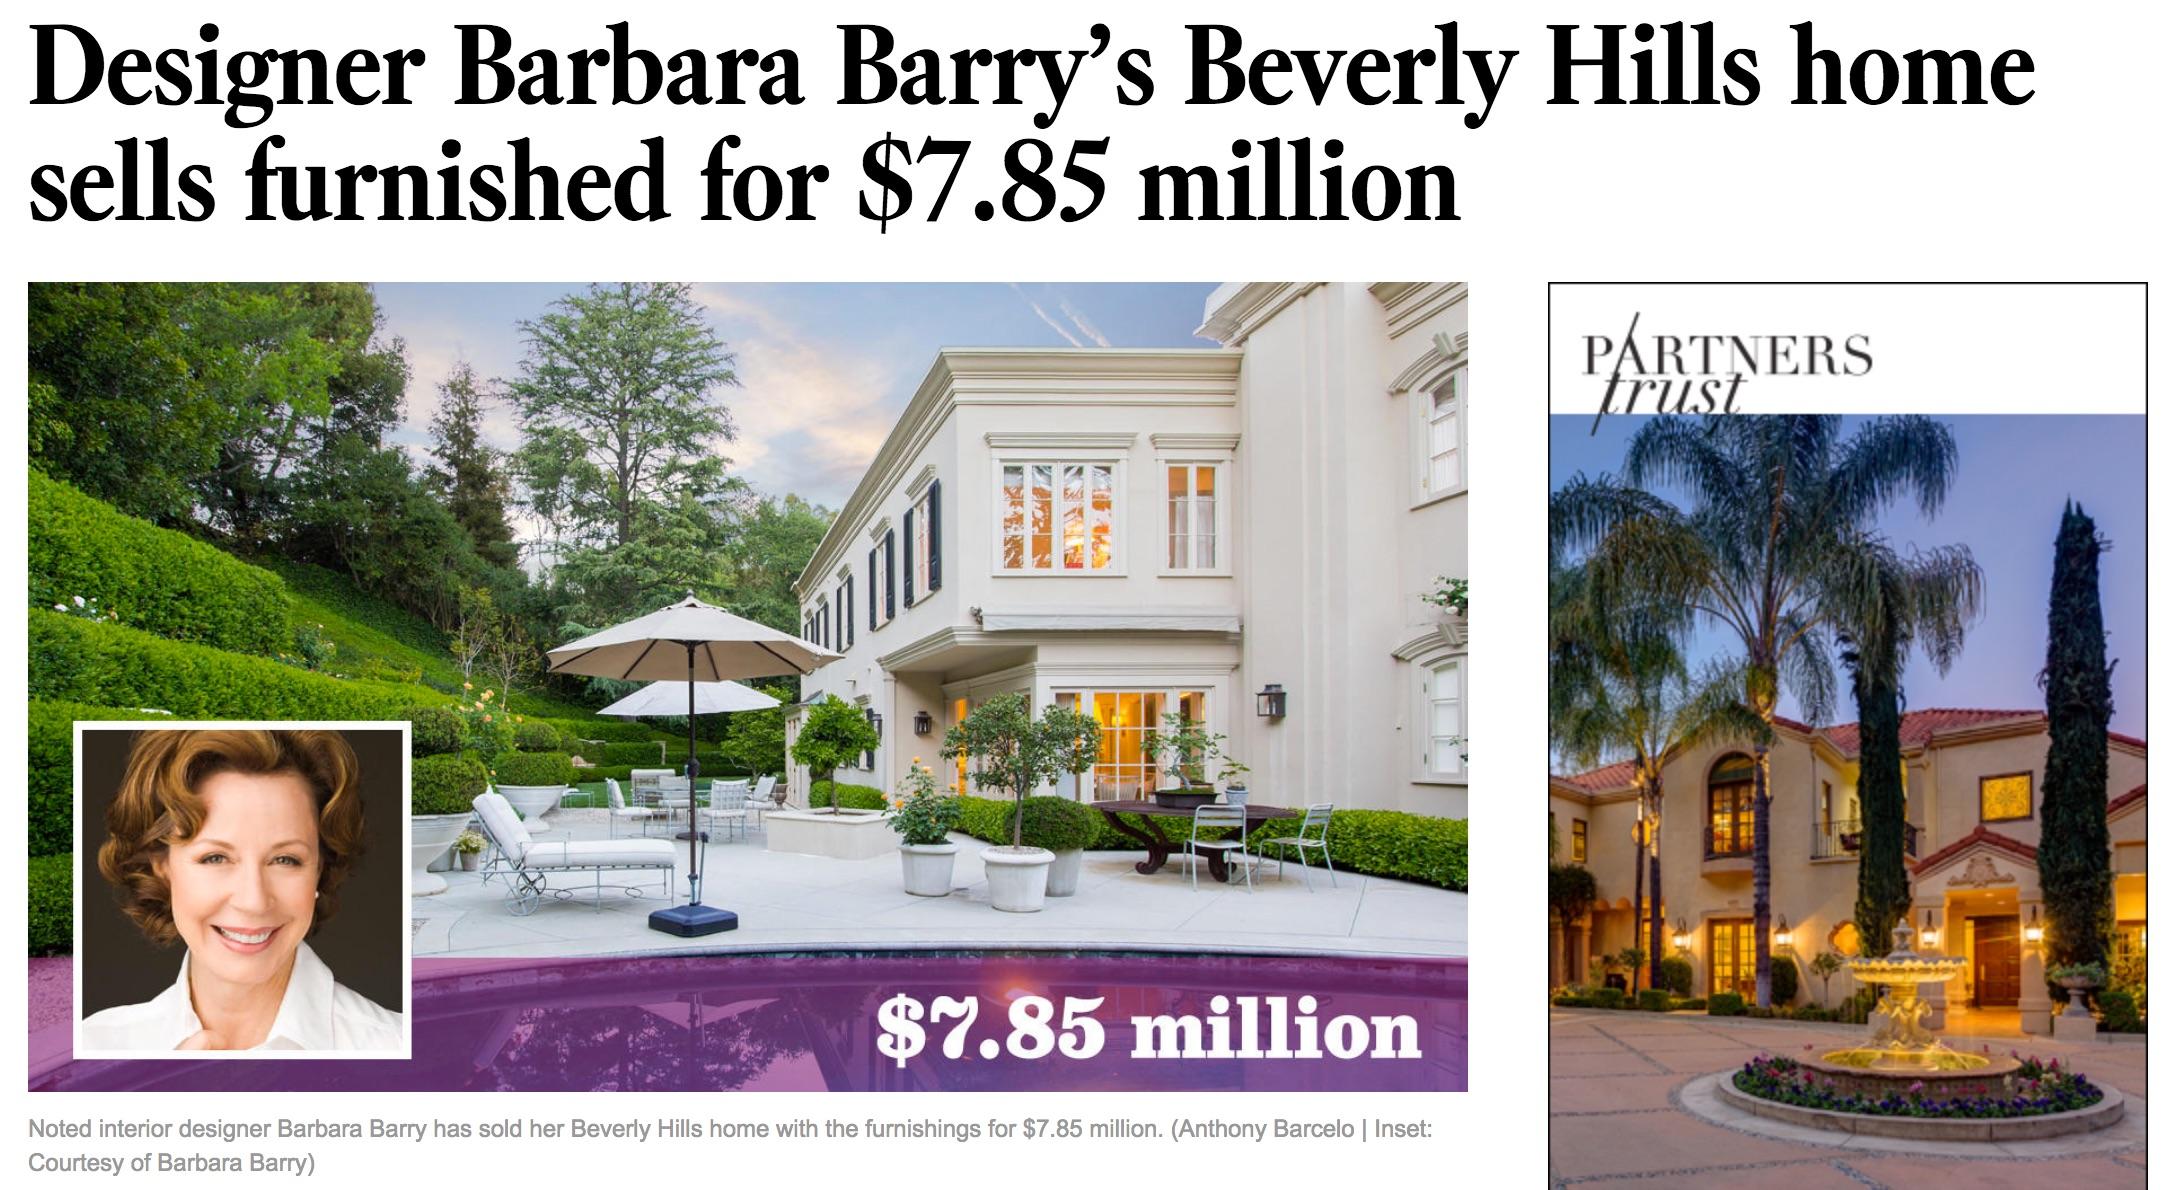 BarbaraBarry.jpg